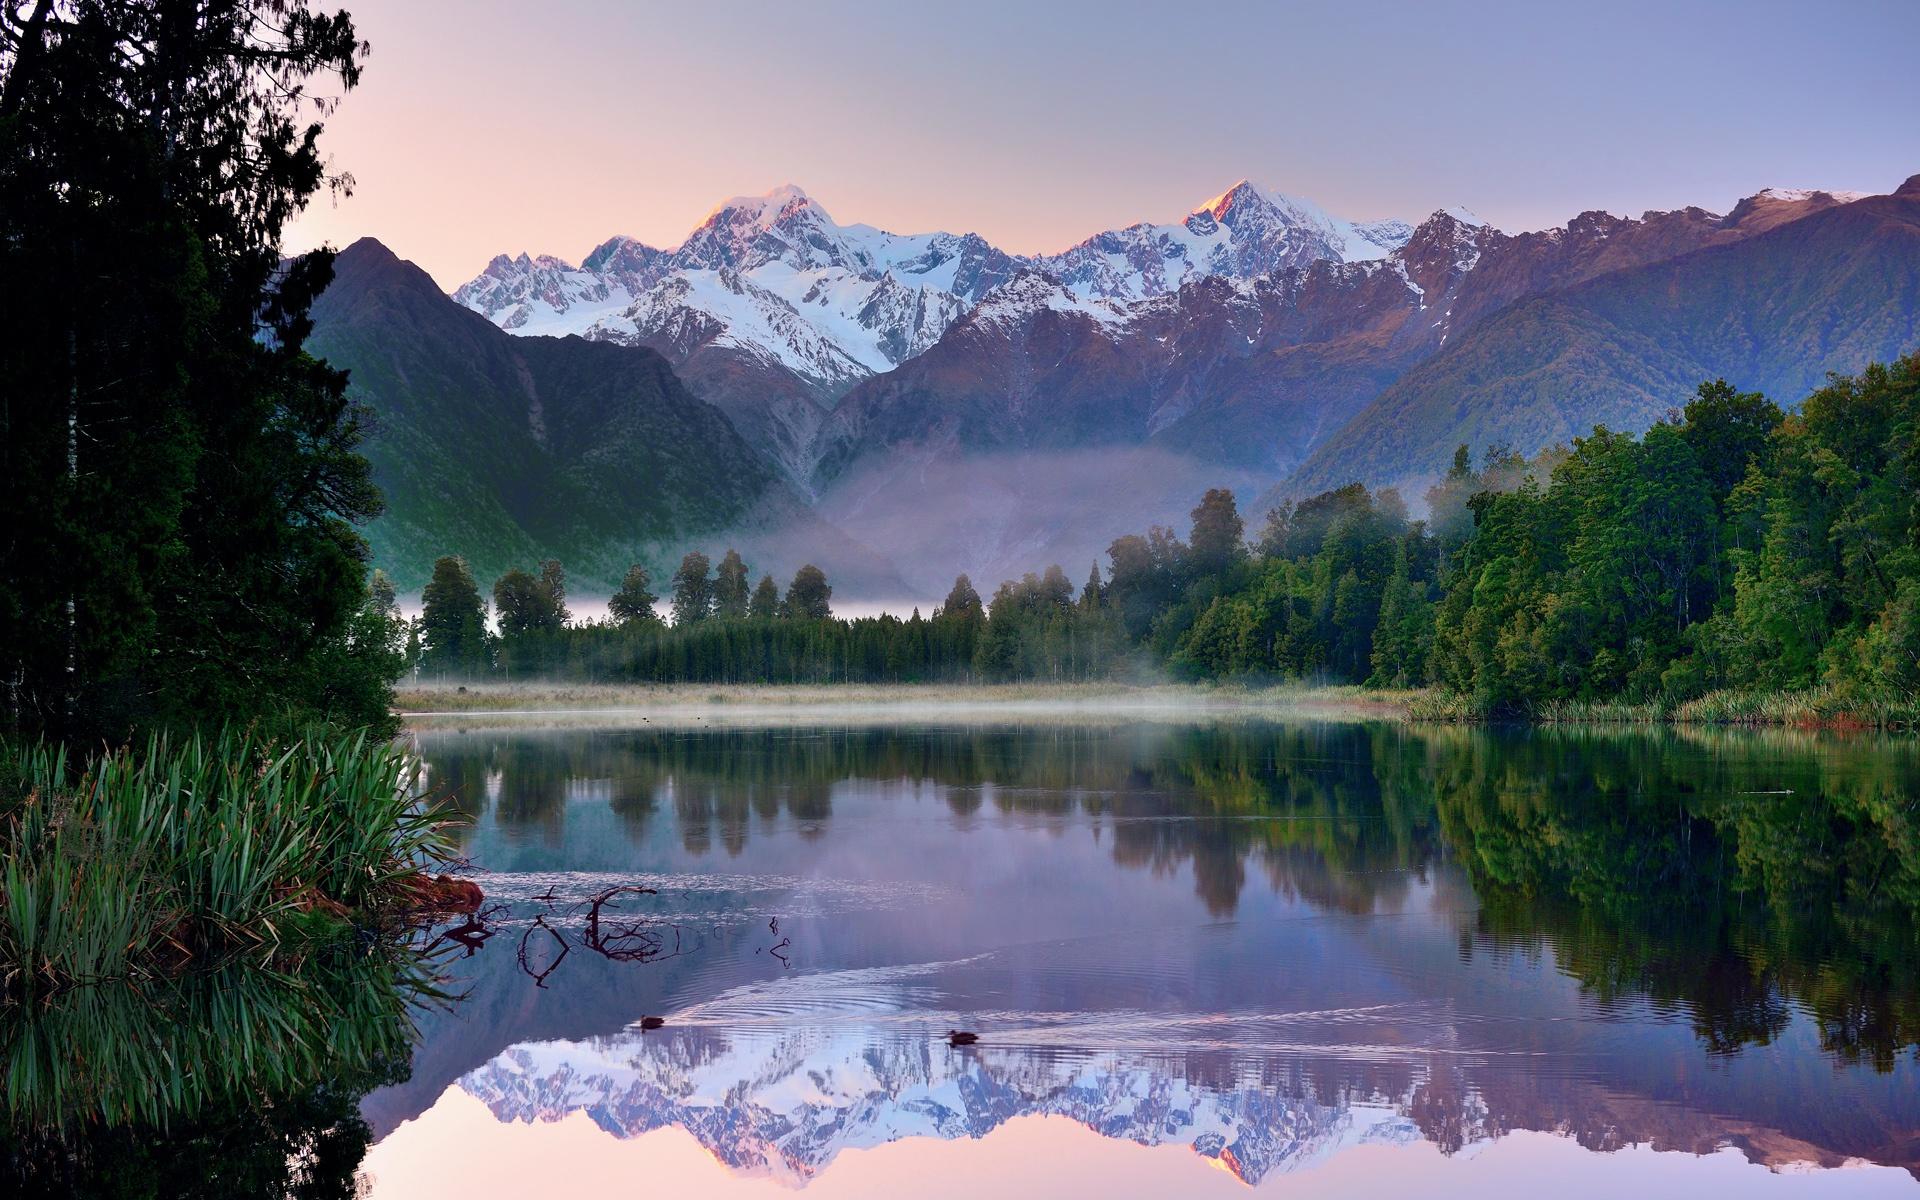 Lake Mountain Reflection Minimalism Wallpapers Hd: 壁紙 ニュージーランドの朝の風景、山、湖、森、水の反射 1920x1200 HD 無料のデスクトップの背景, 画像